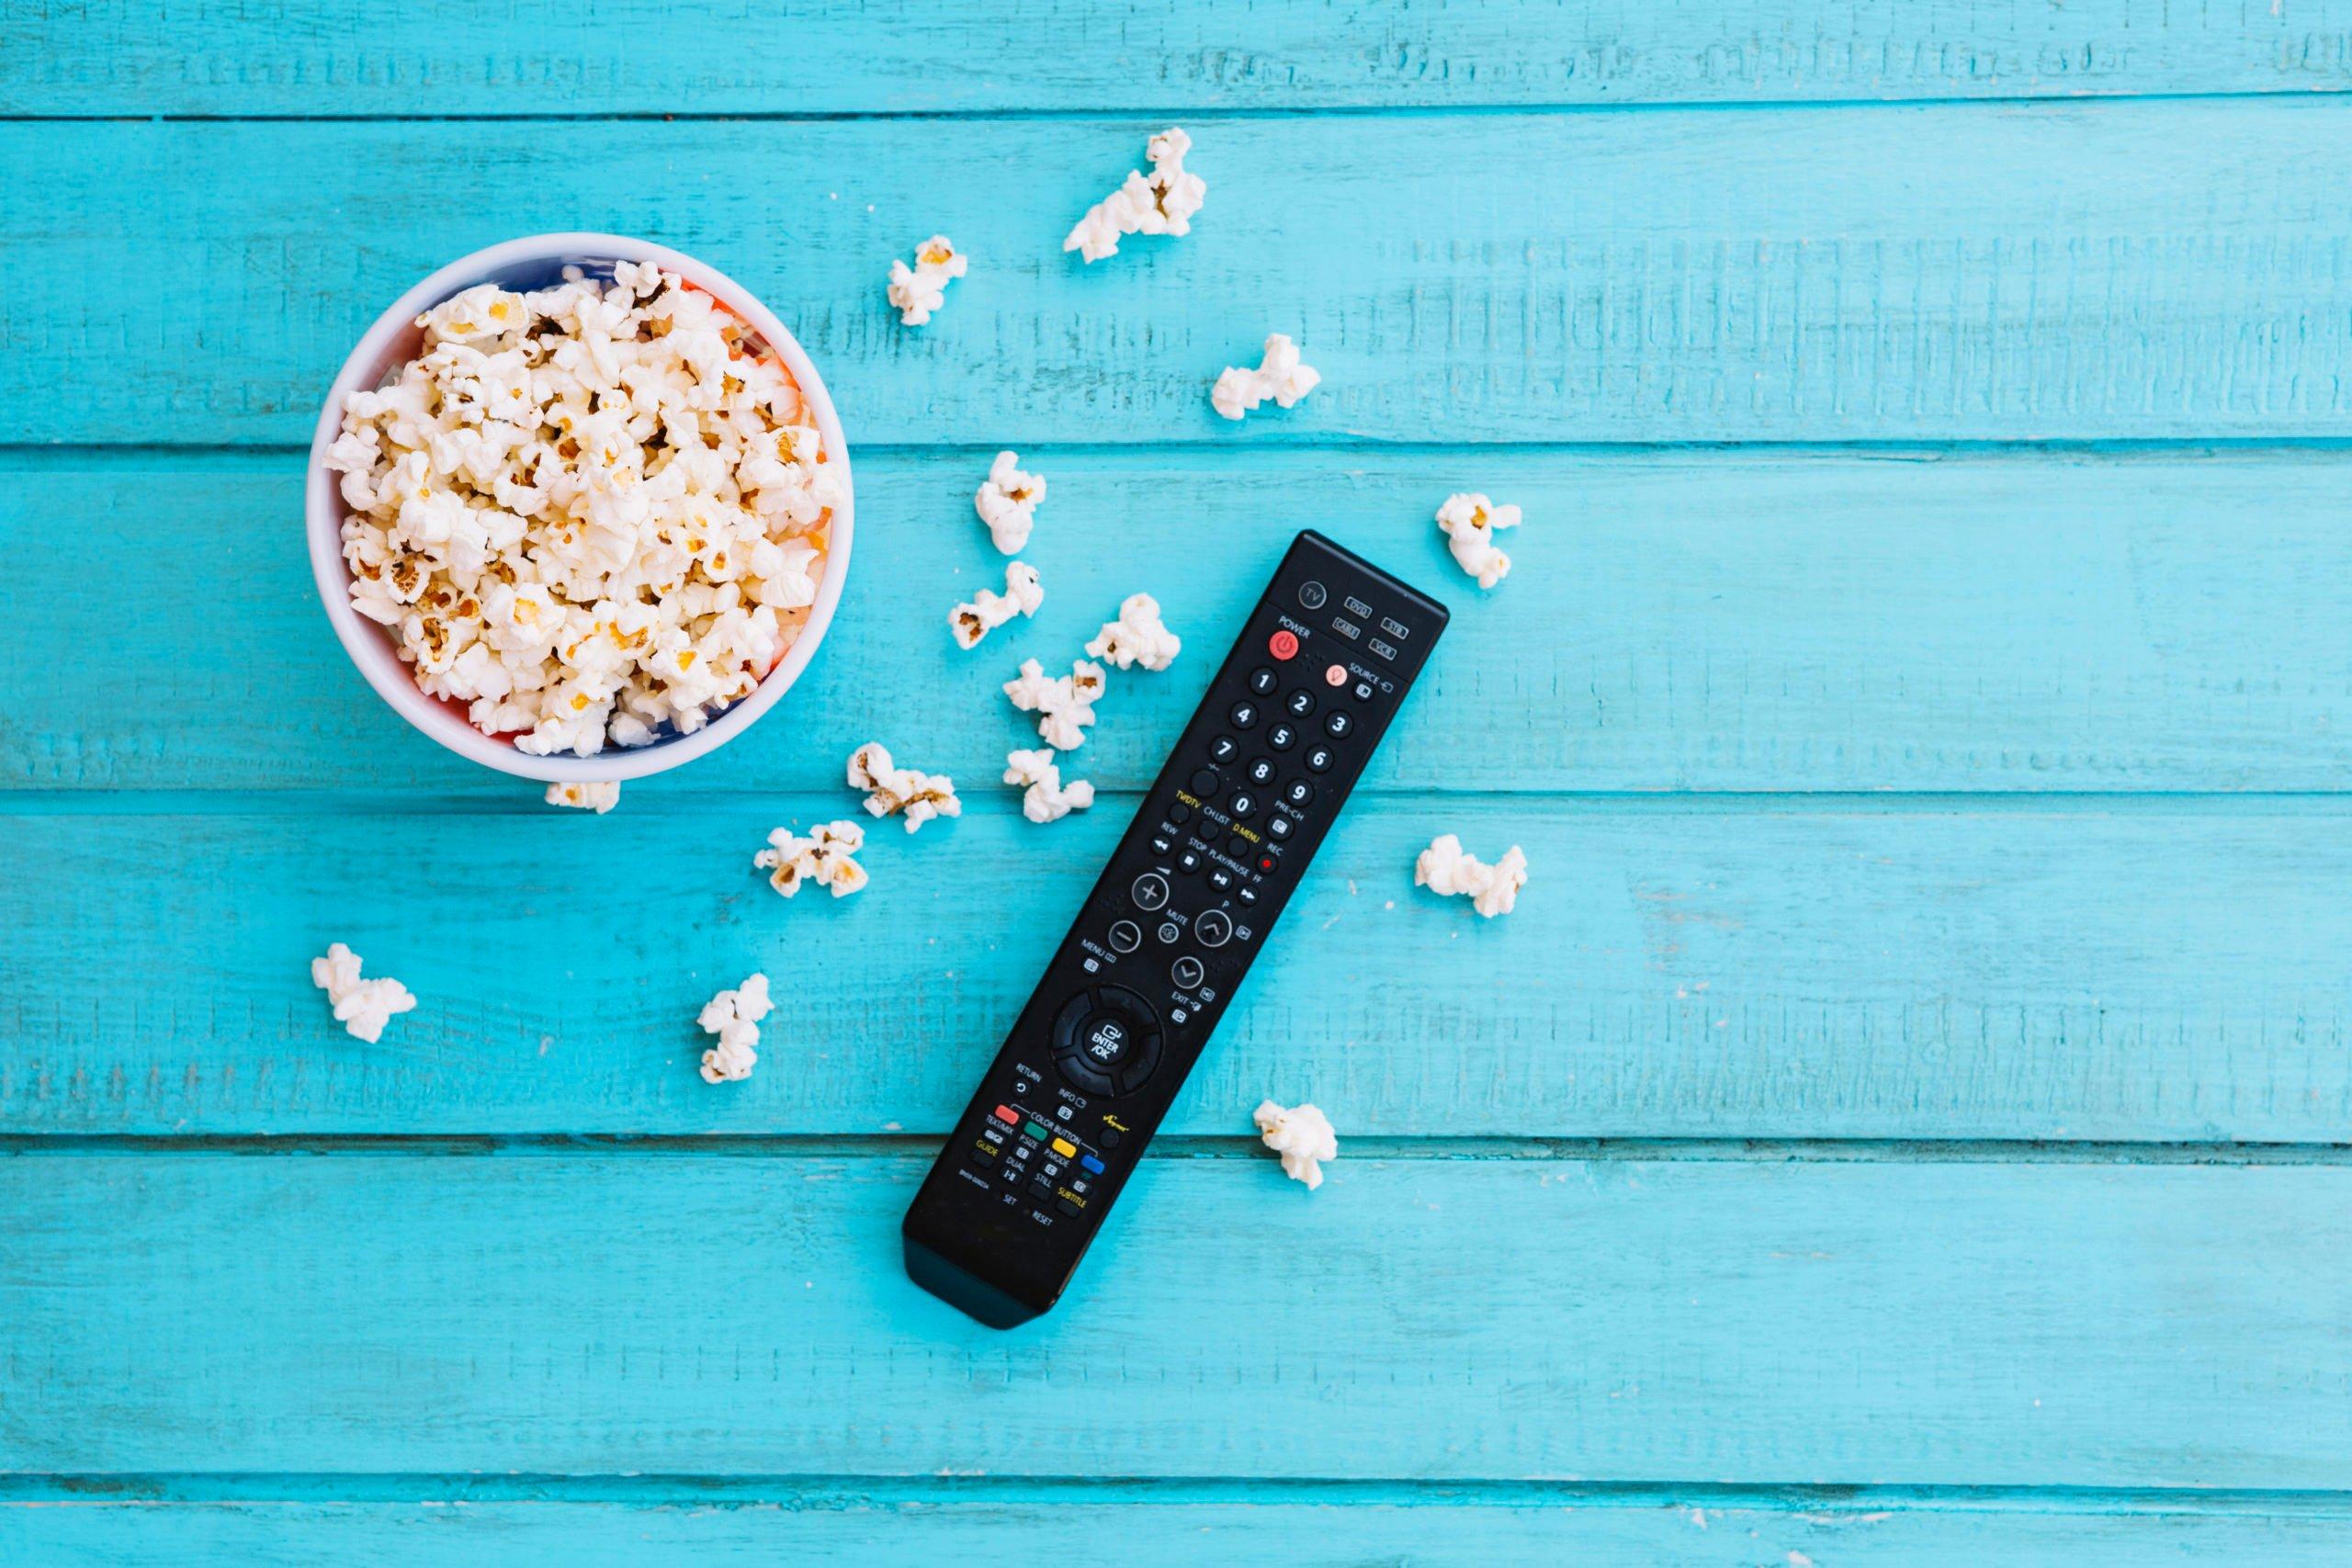 tv-remote-control-popcorn-296075-fDfcRhcX-scaled